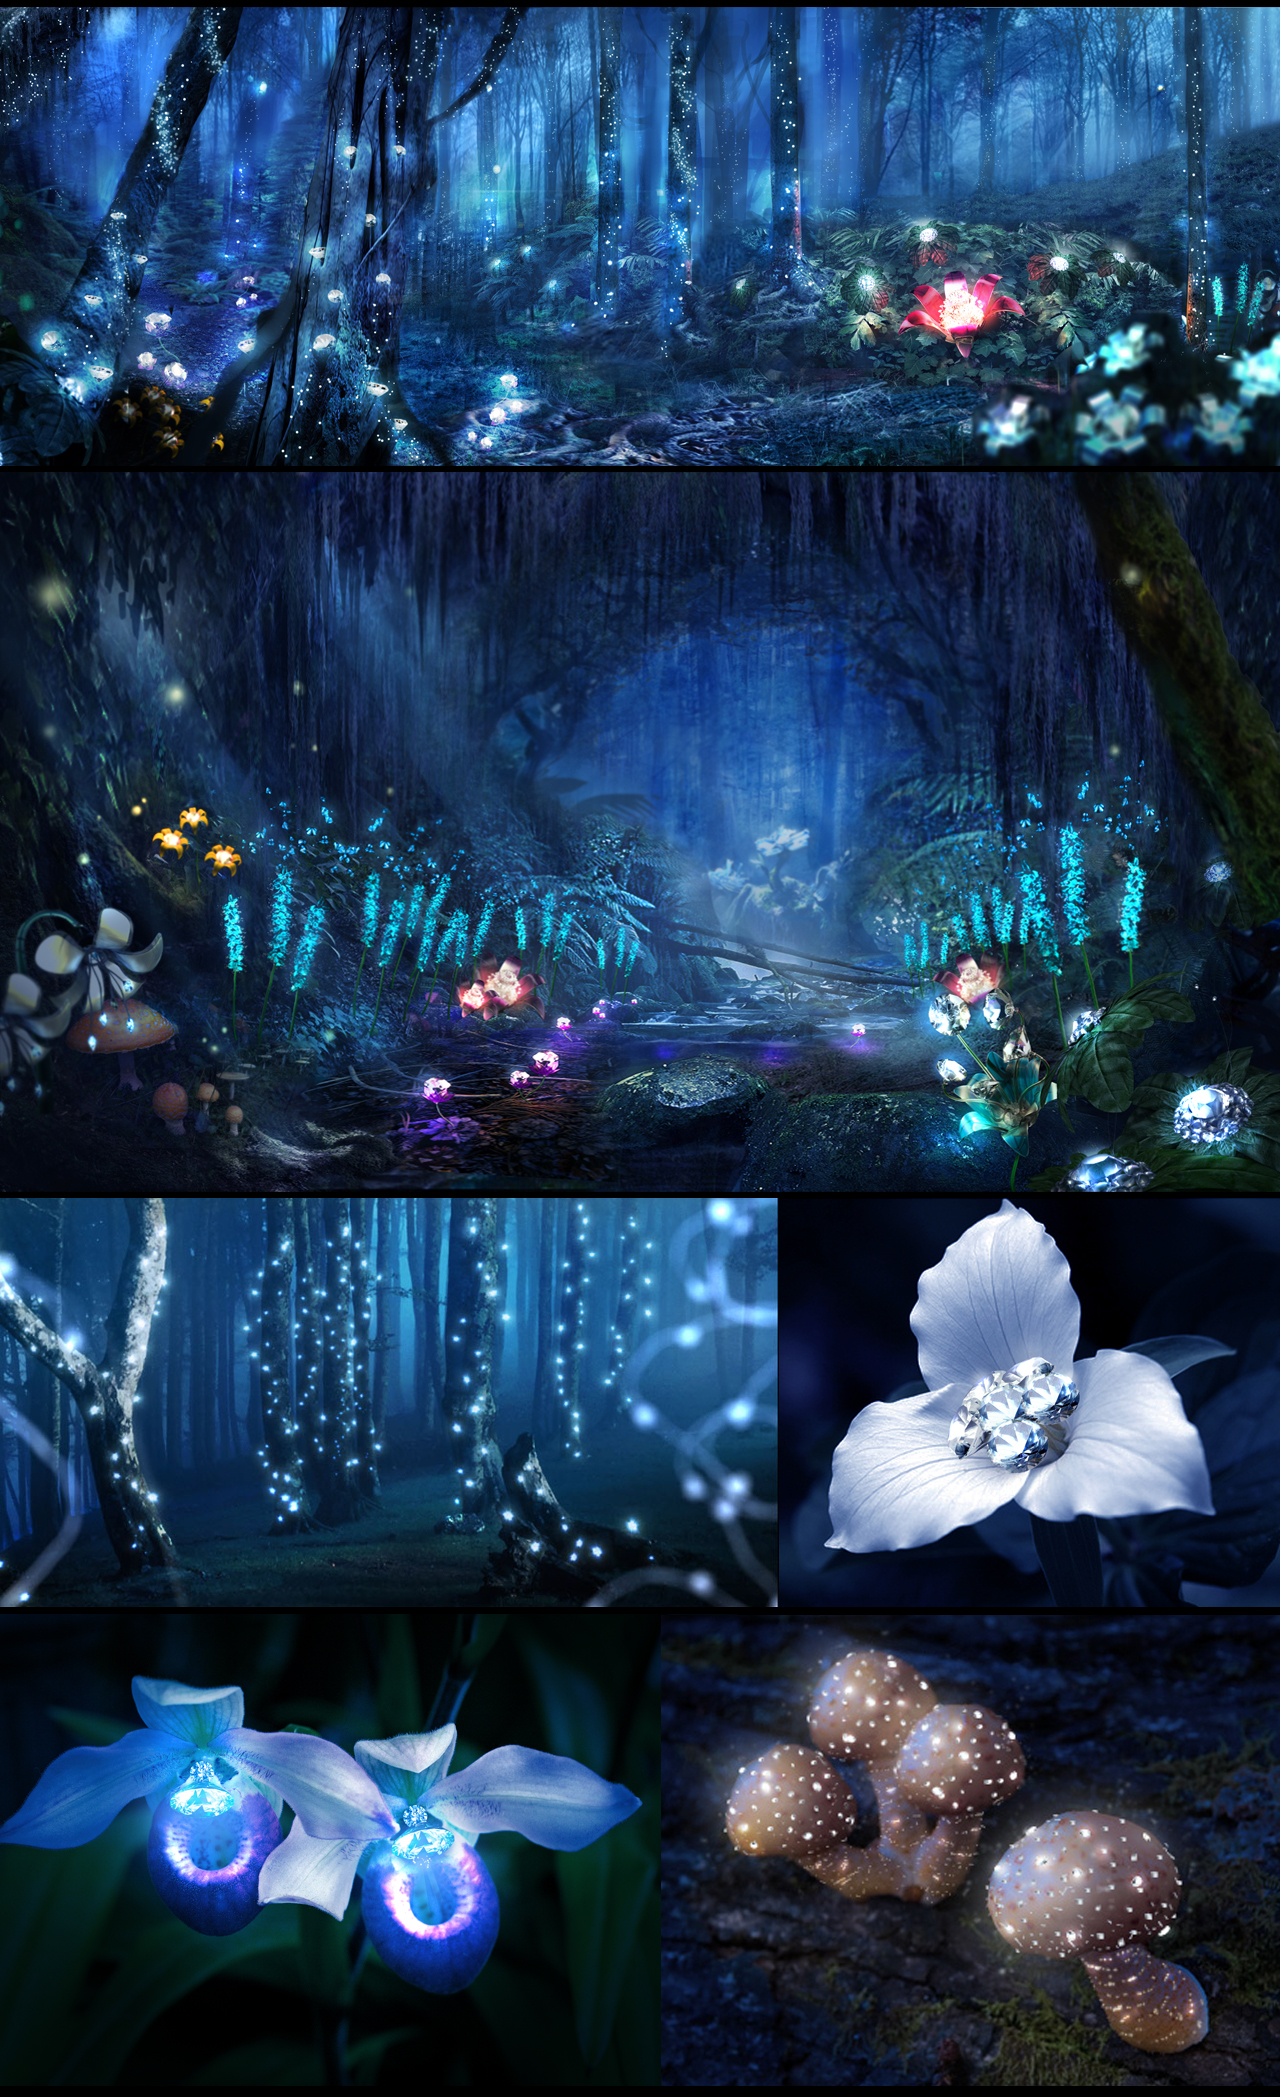 diamondforest_studies.jpg